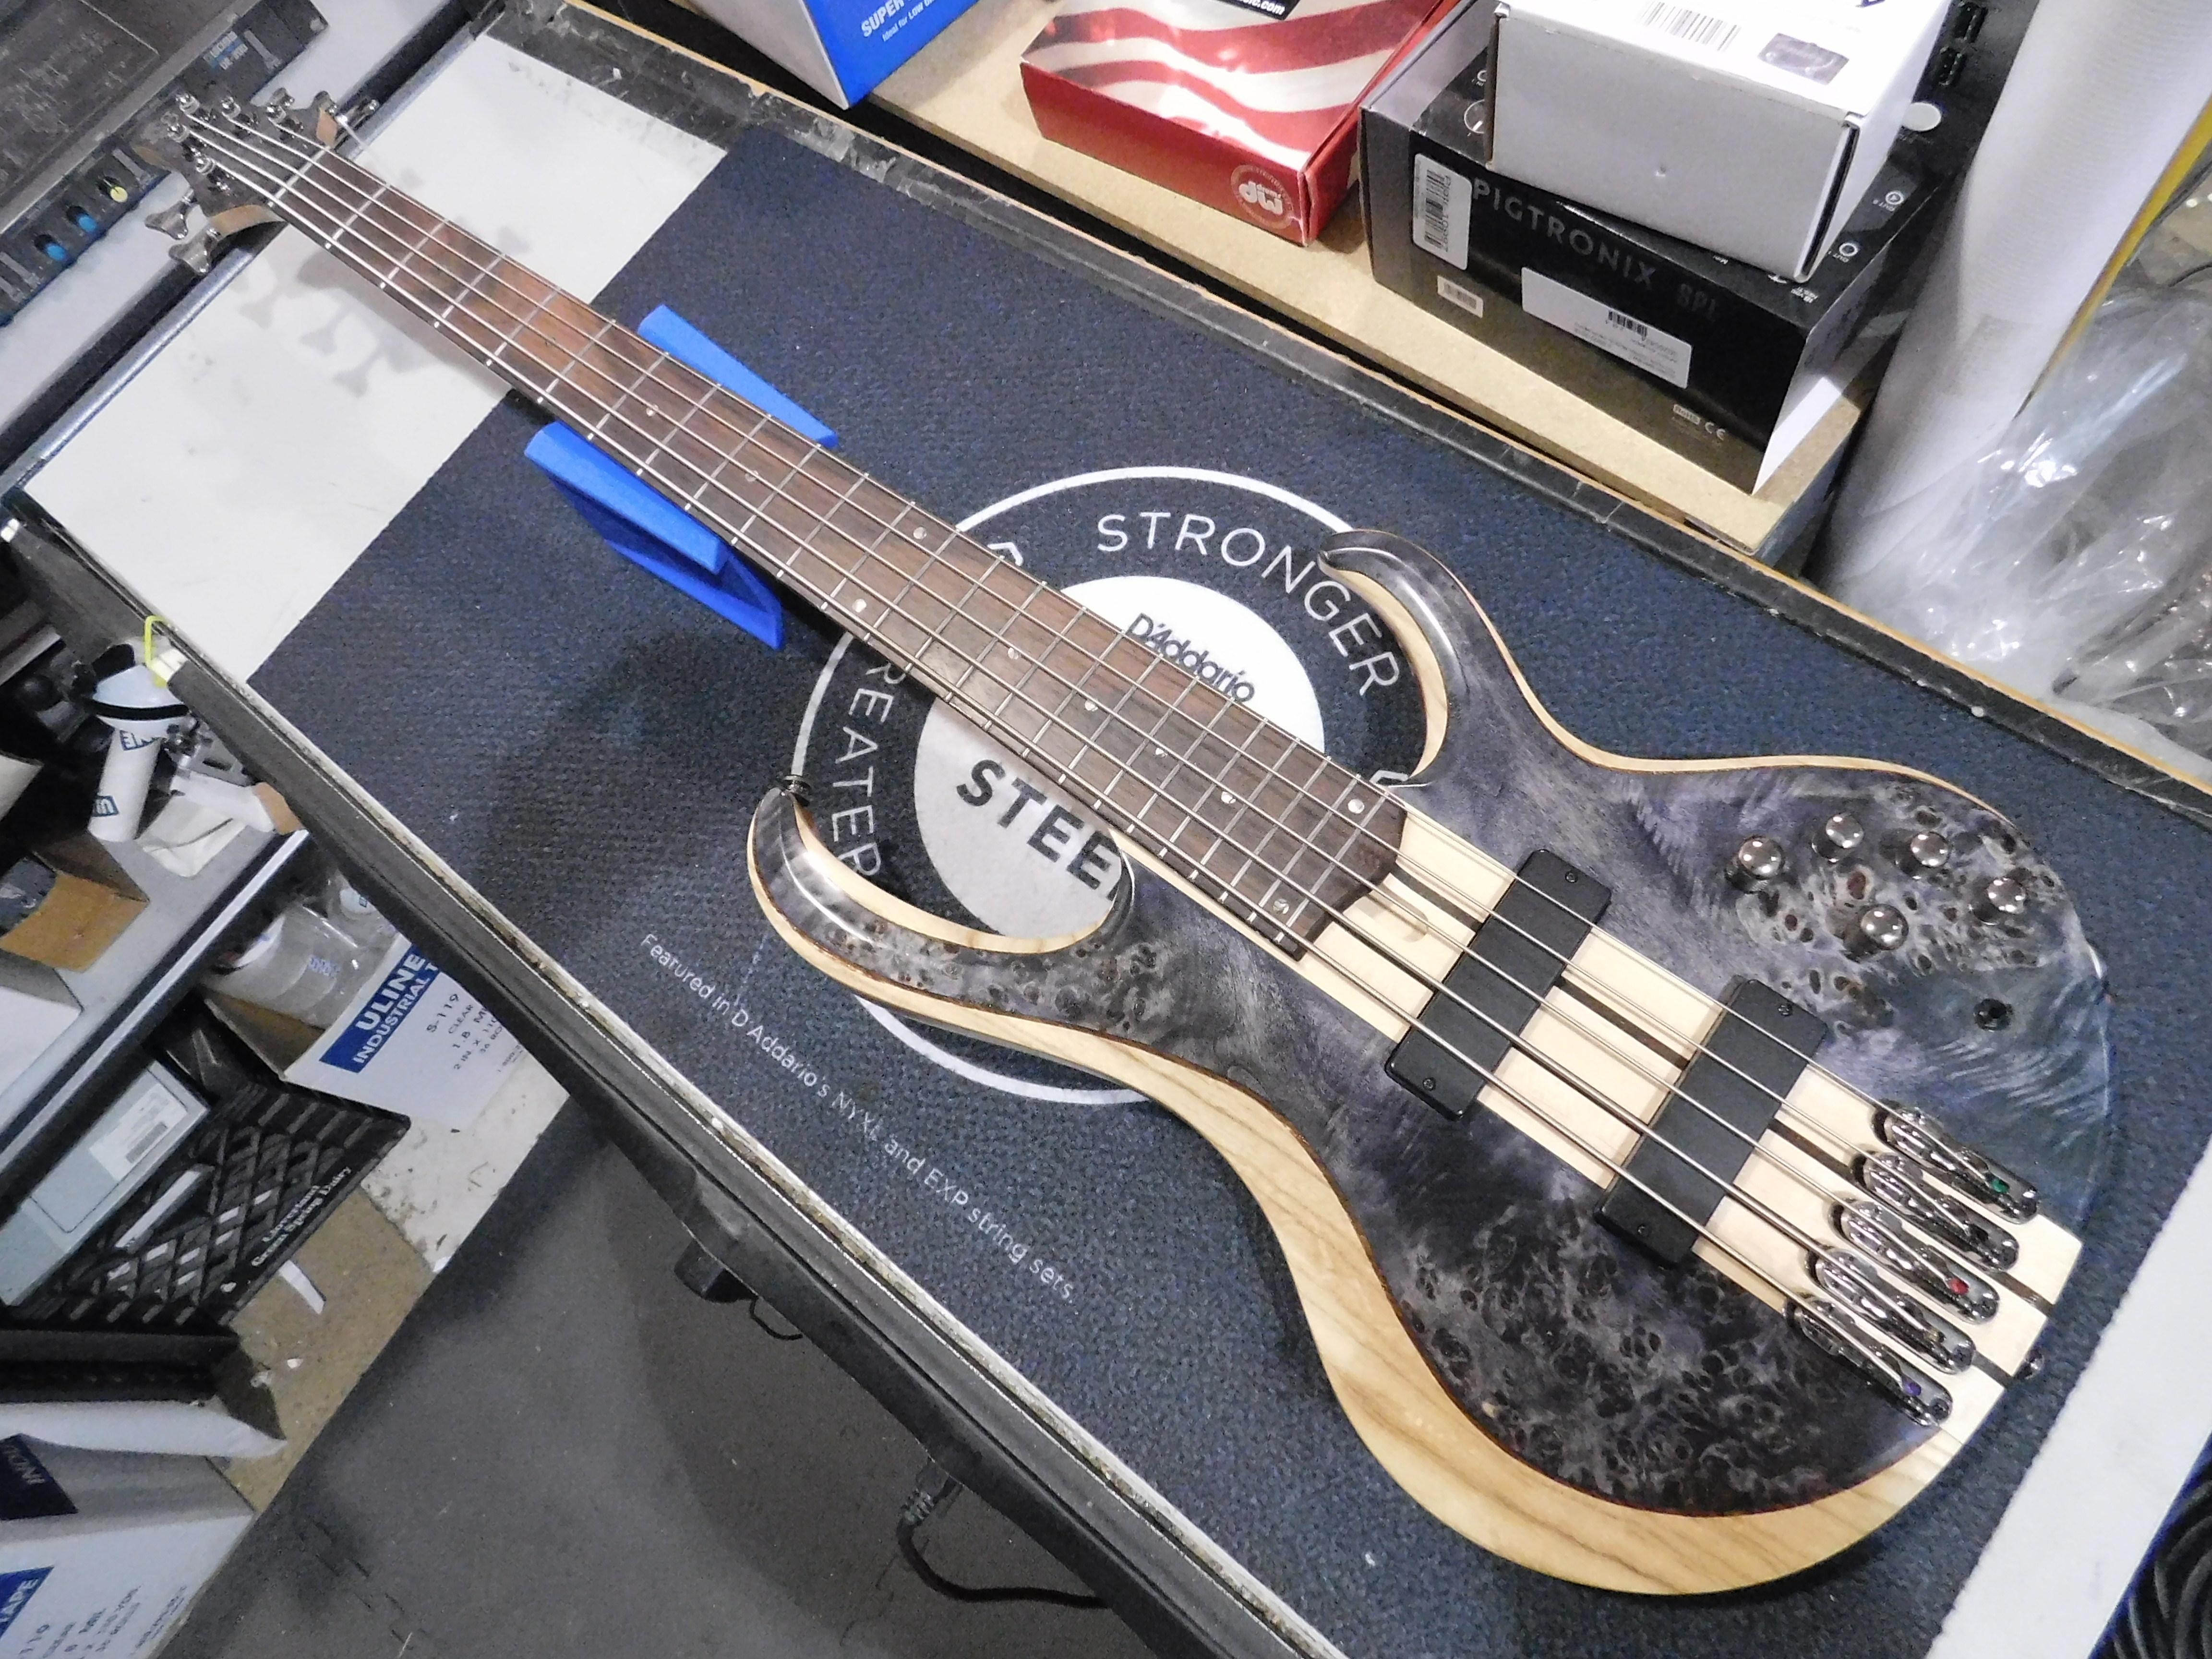 IBANEZ BTB845 5-String Electric Bass with Gig-bag - Deep Twilight Low Gloss